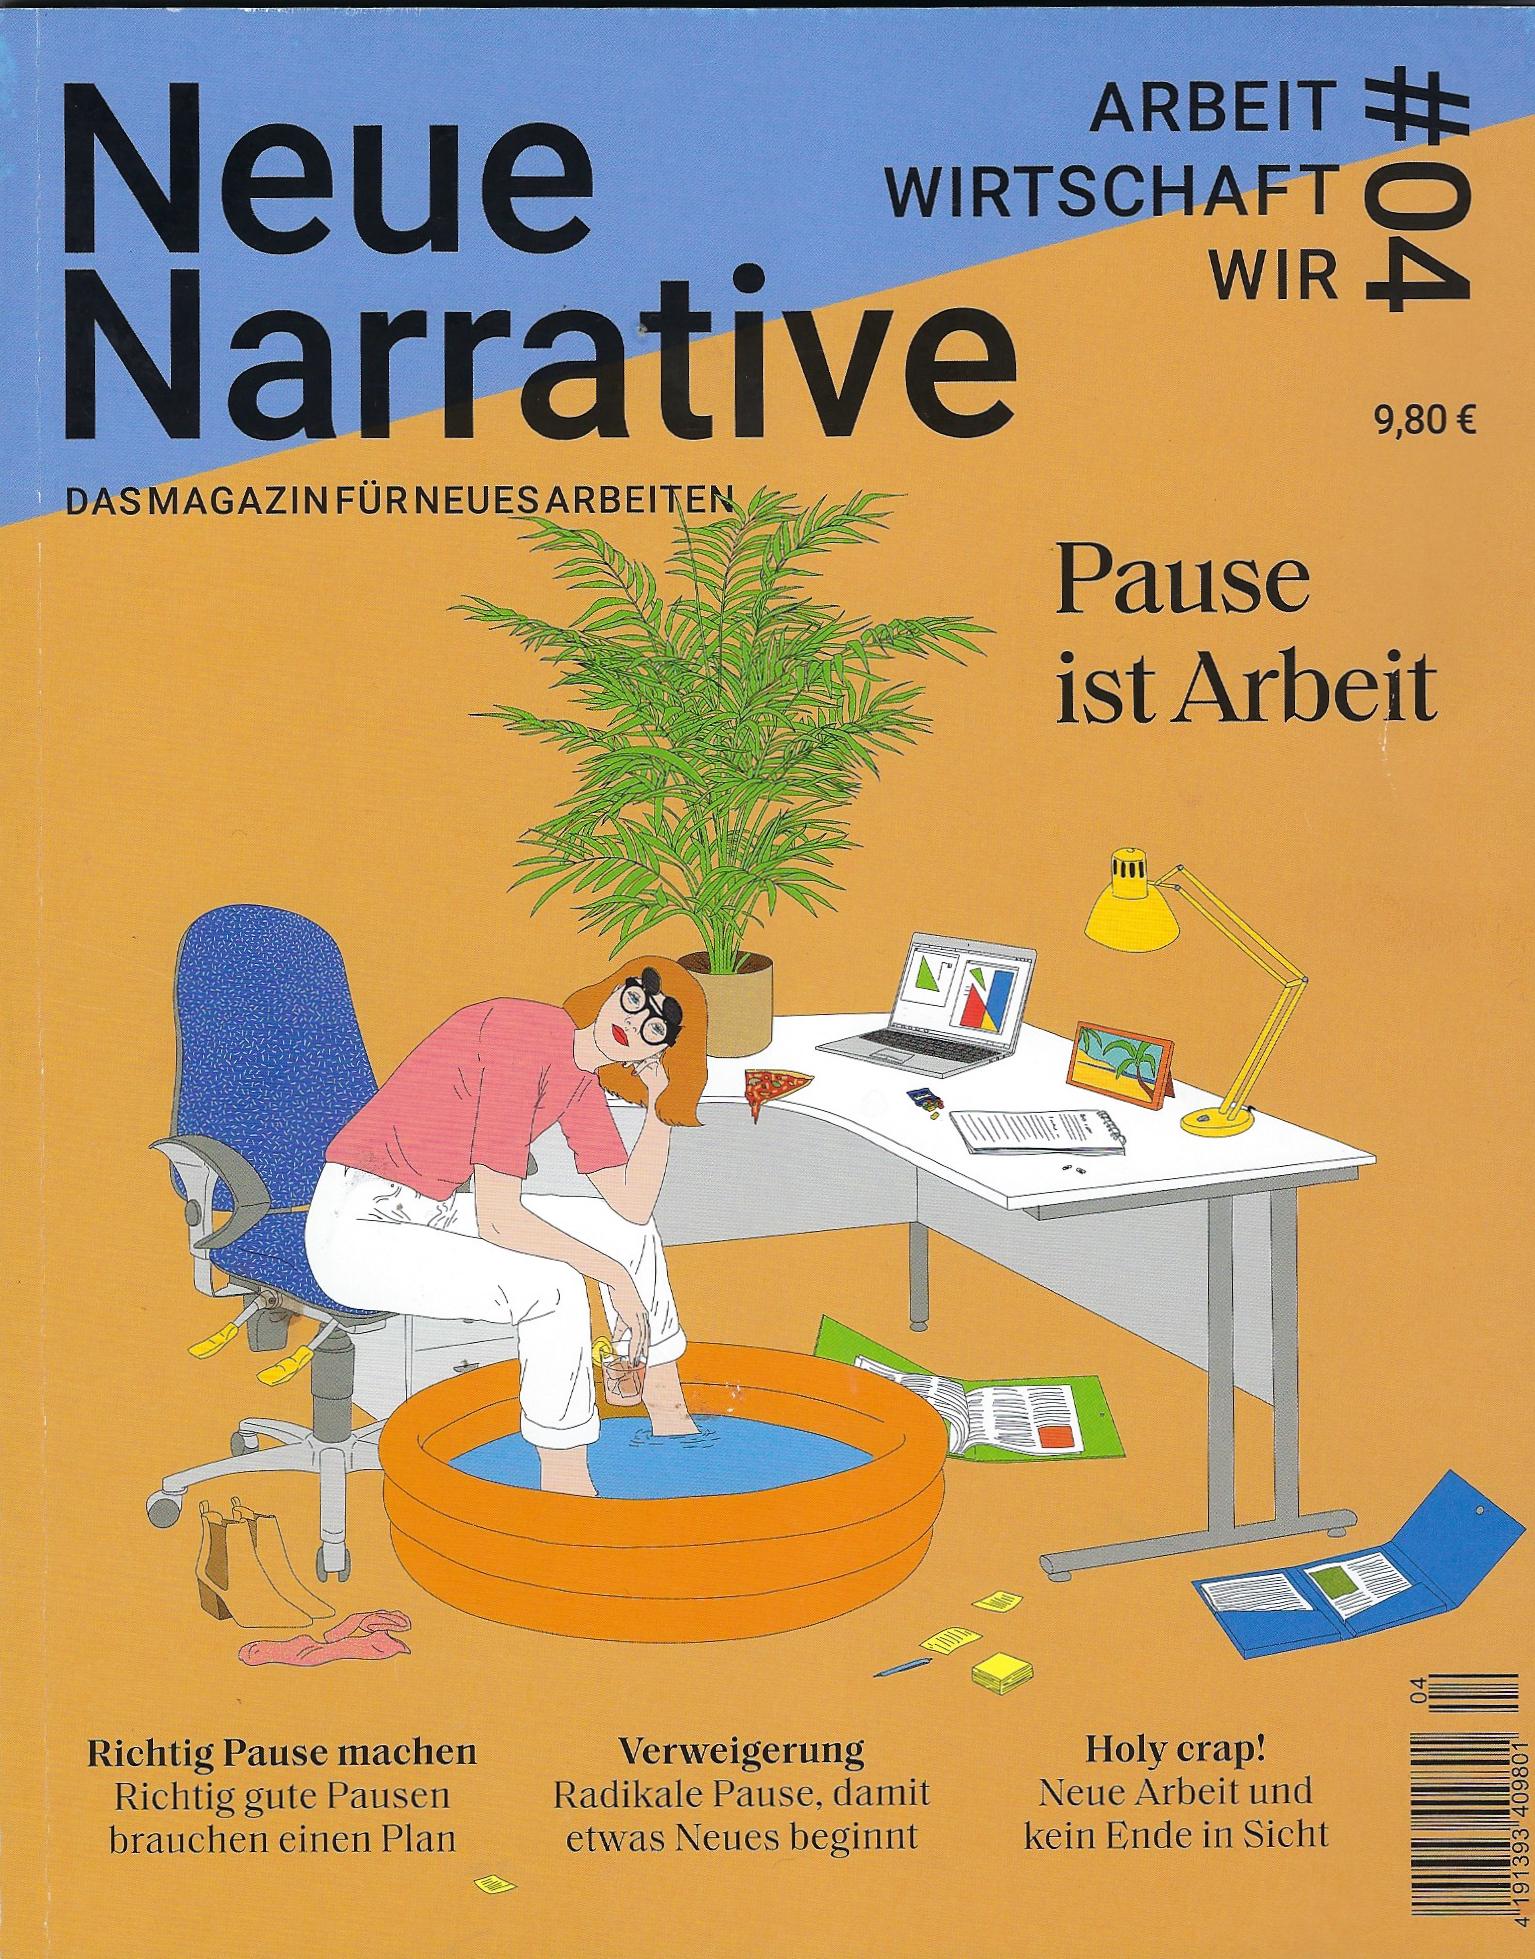 Neue Narrative 13.jpg